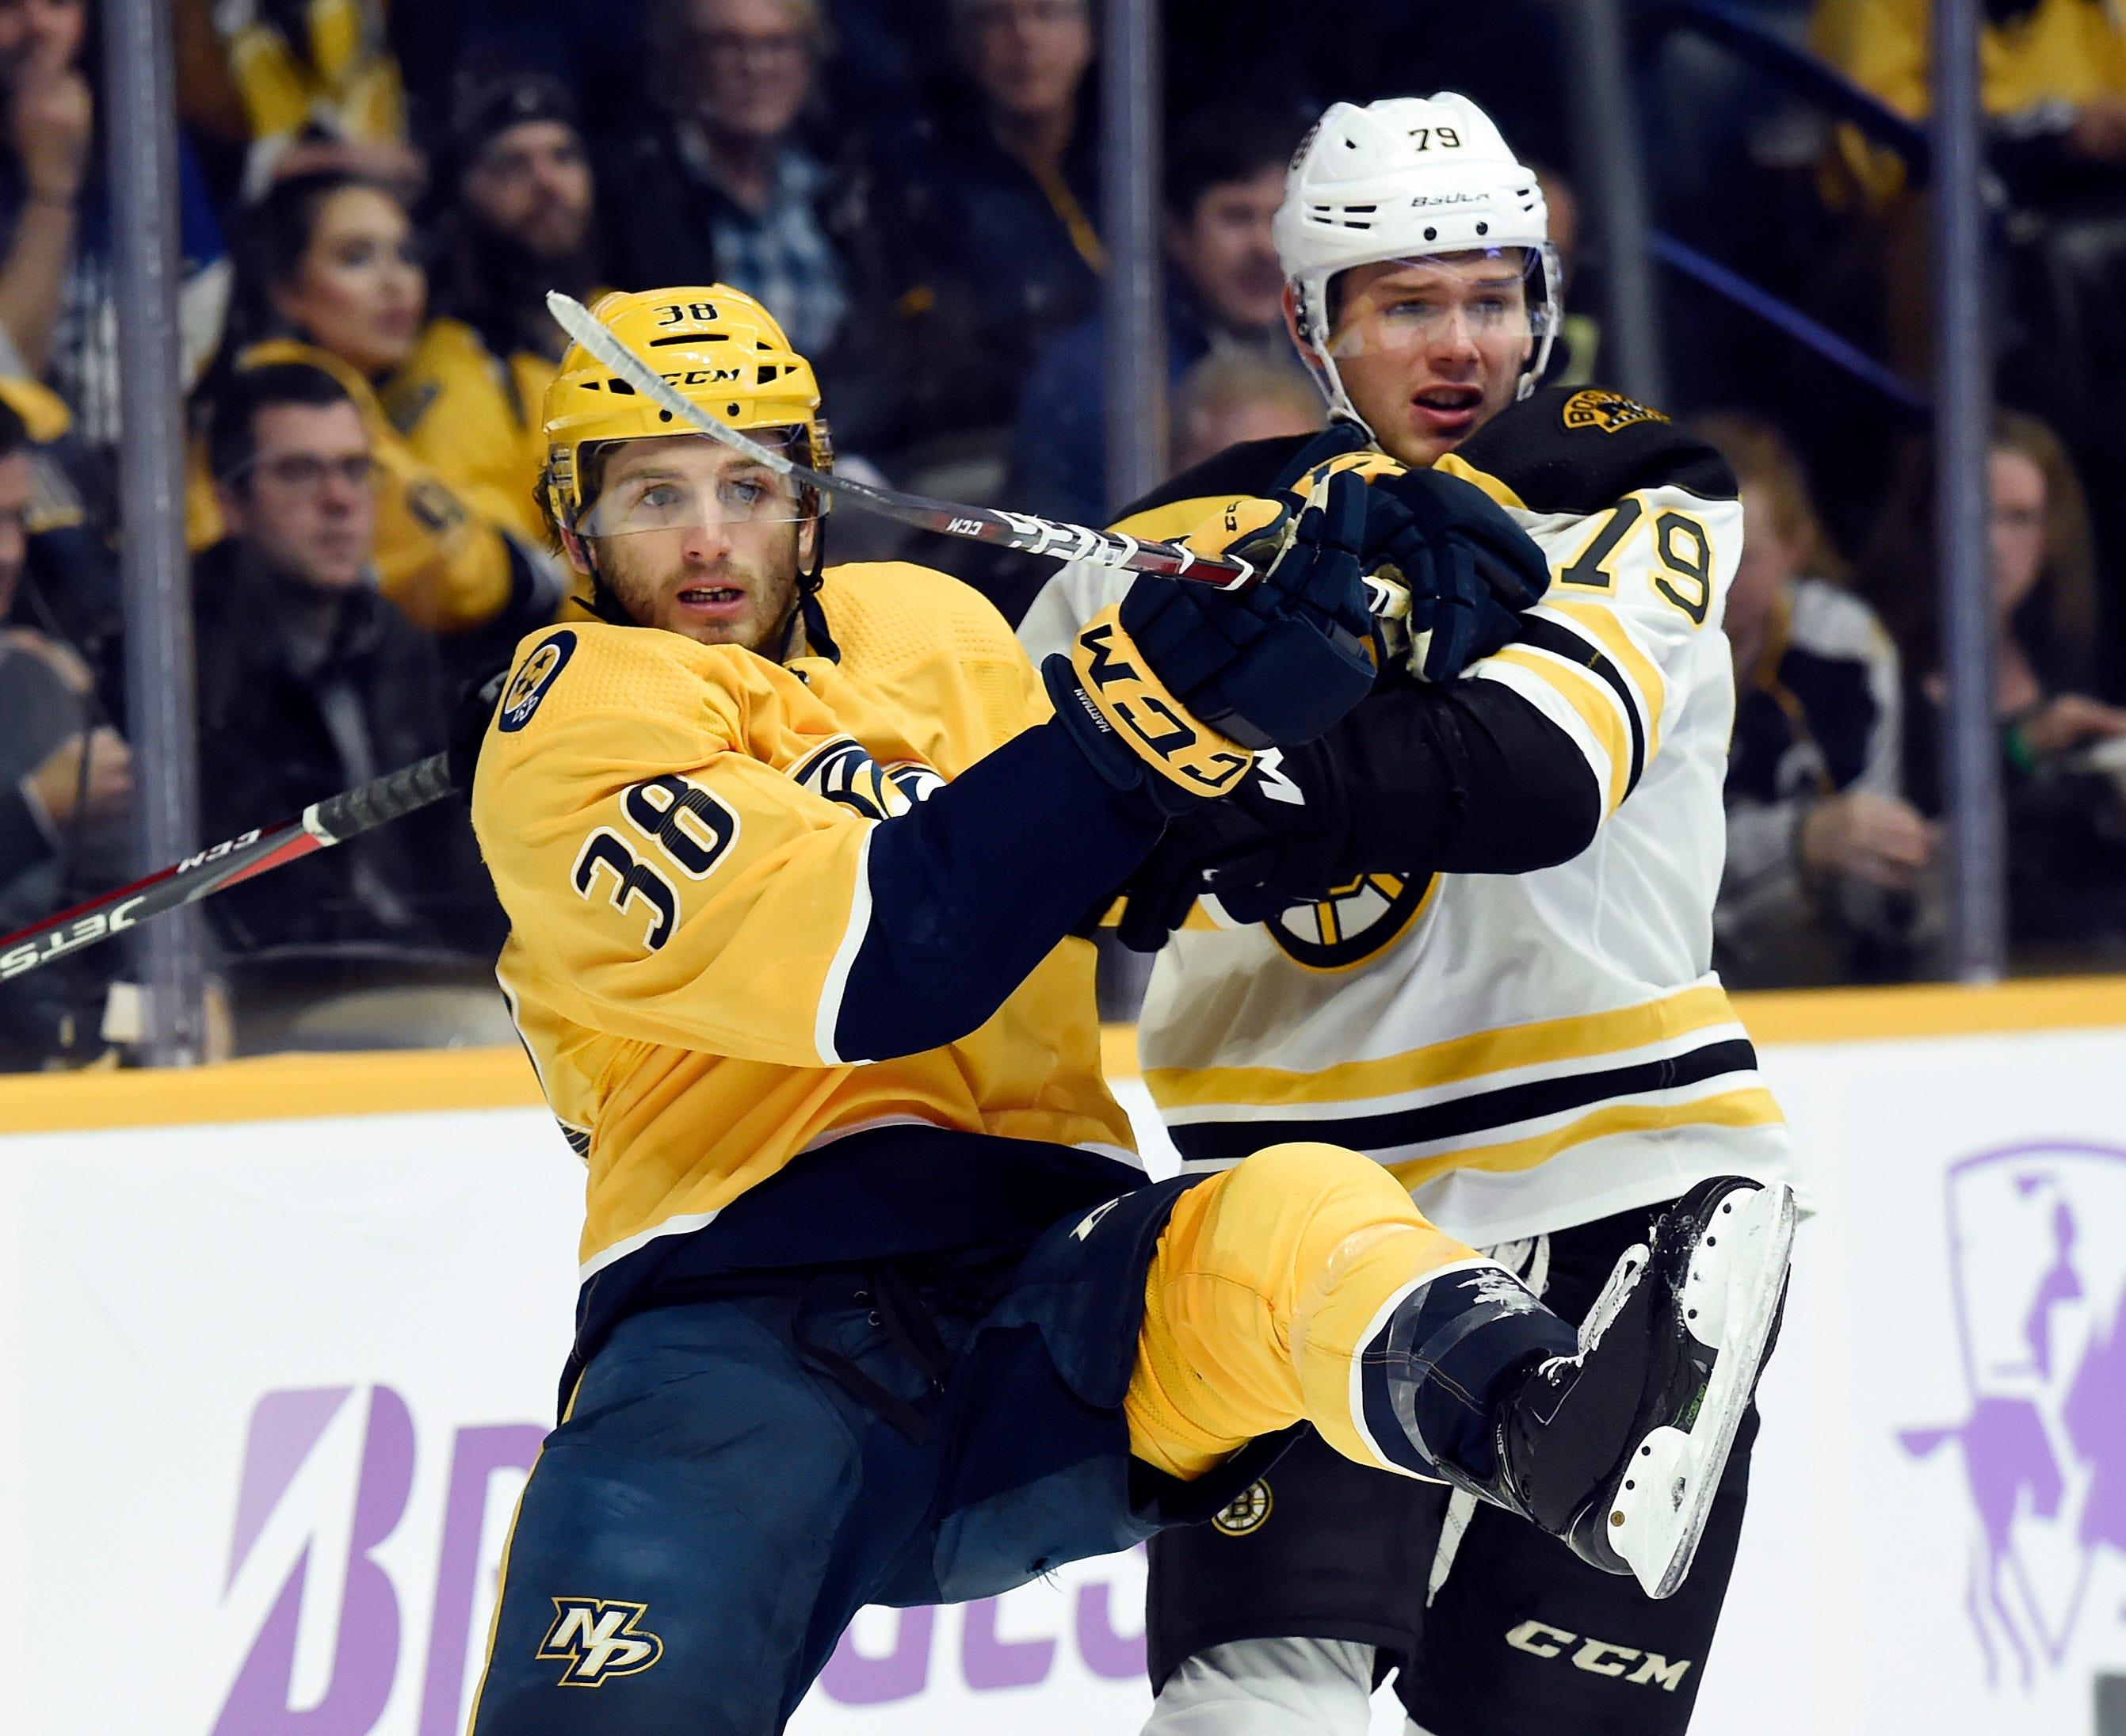 Rinne shuts out Bruins on 36th birthday, Predators win 1-0